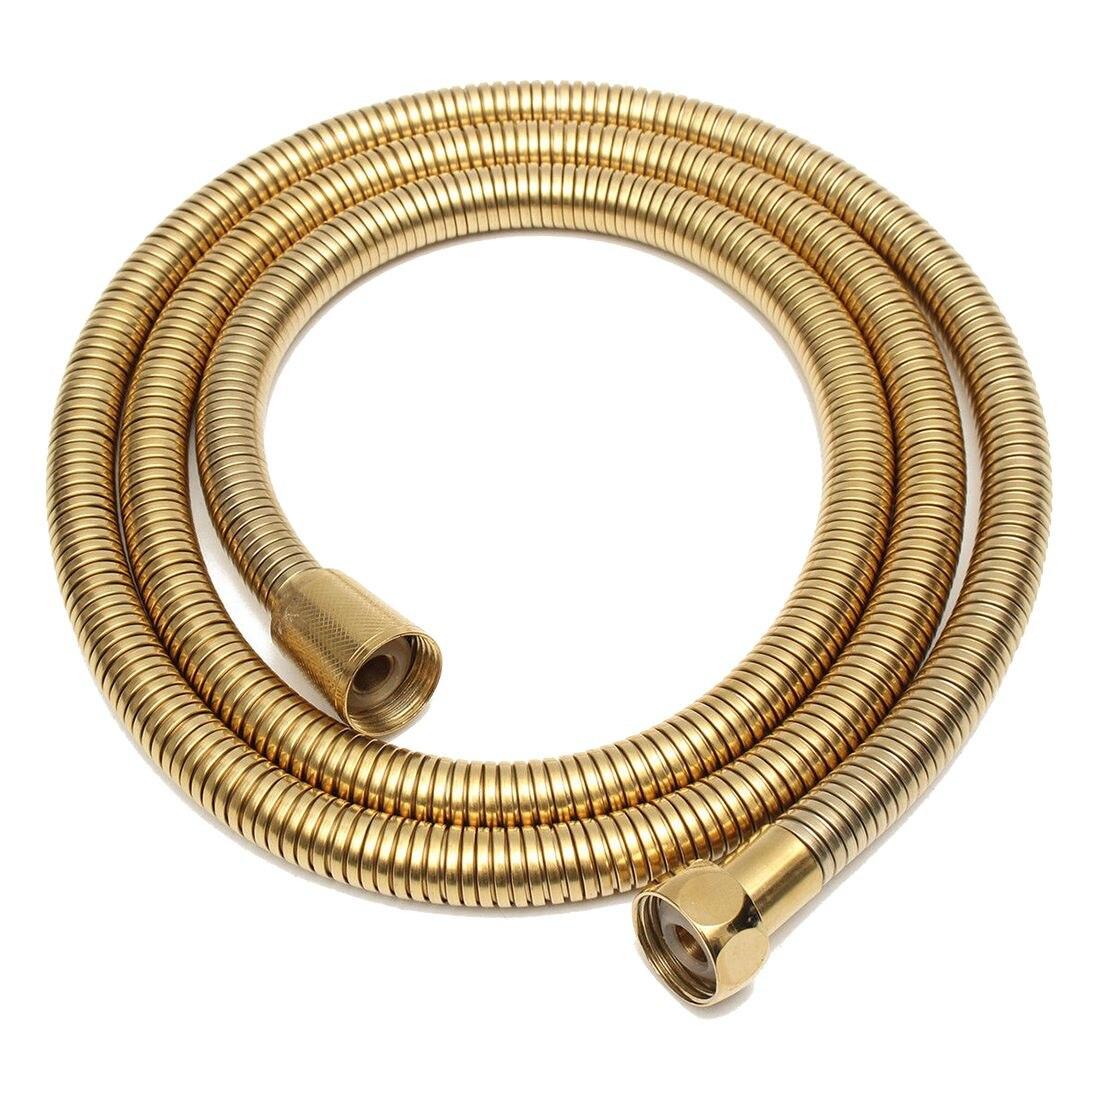 SANQ 1.5m Gold Shower Head Hose Long Flexible Stainless Steel Bathroom Water Tube